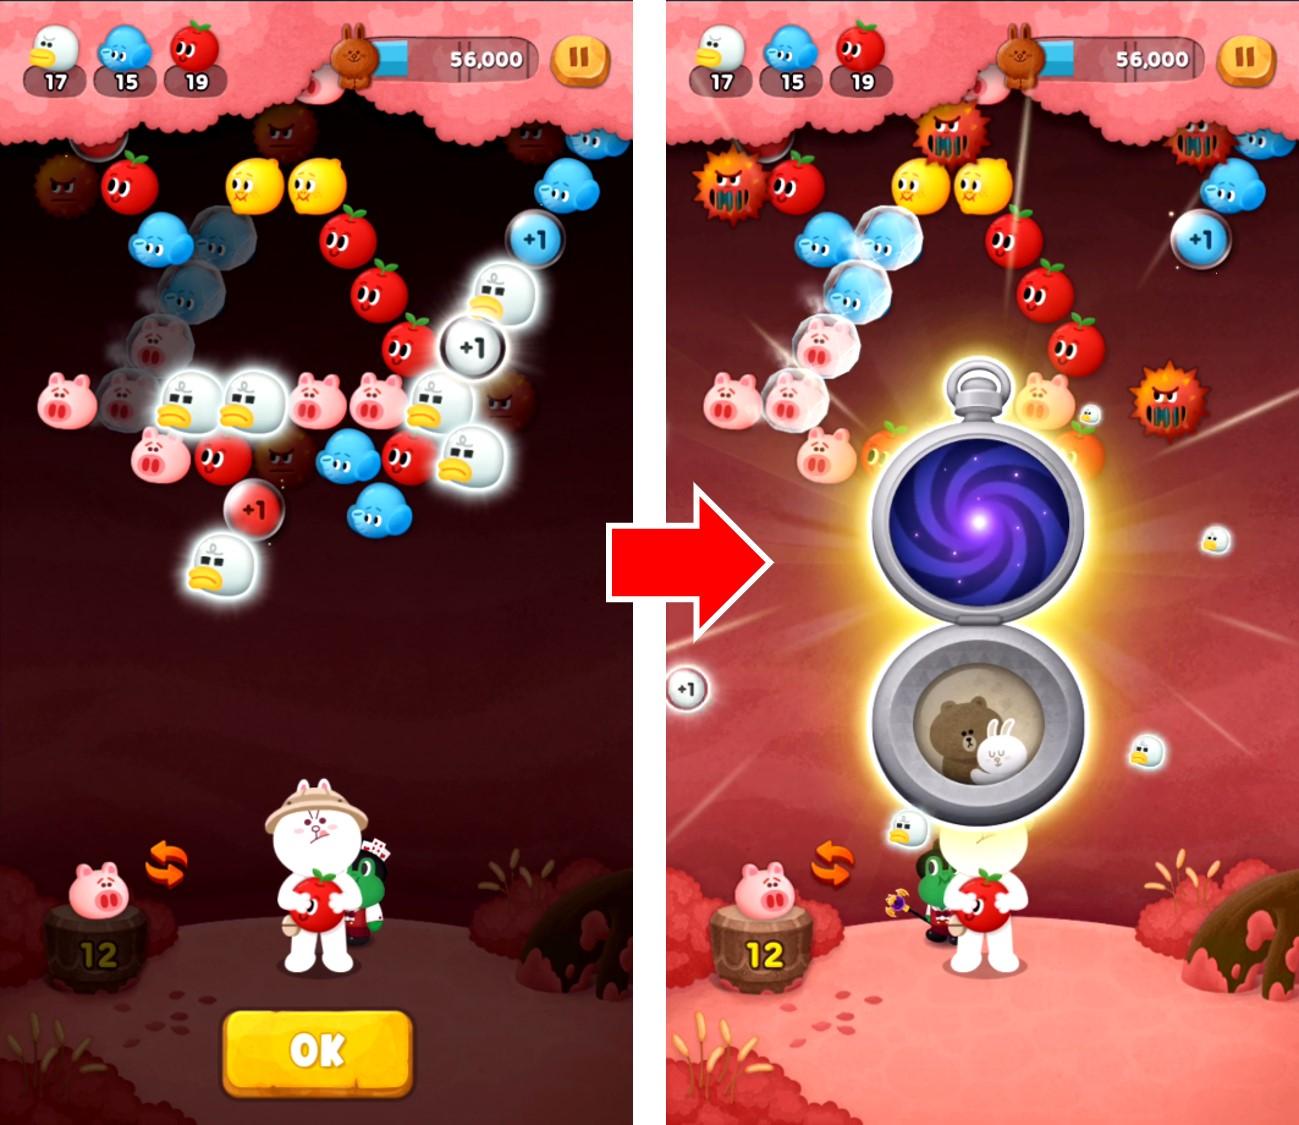 LINE バブル2【攻略】: ステージ攻略に役立つアイテム一覧